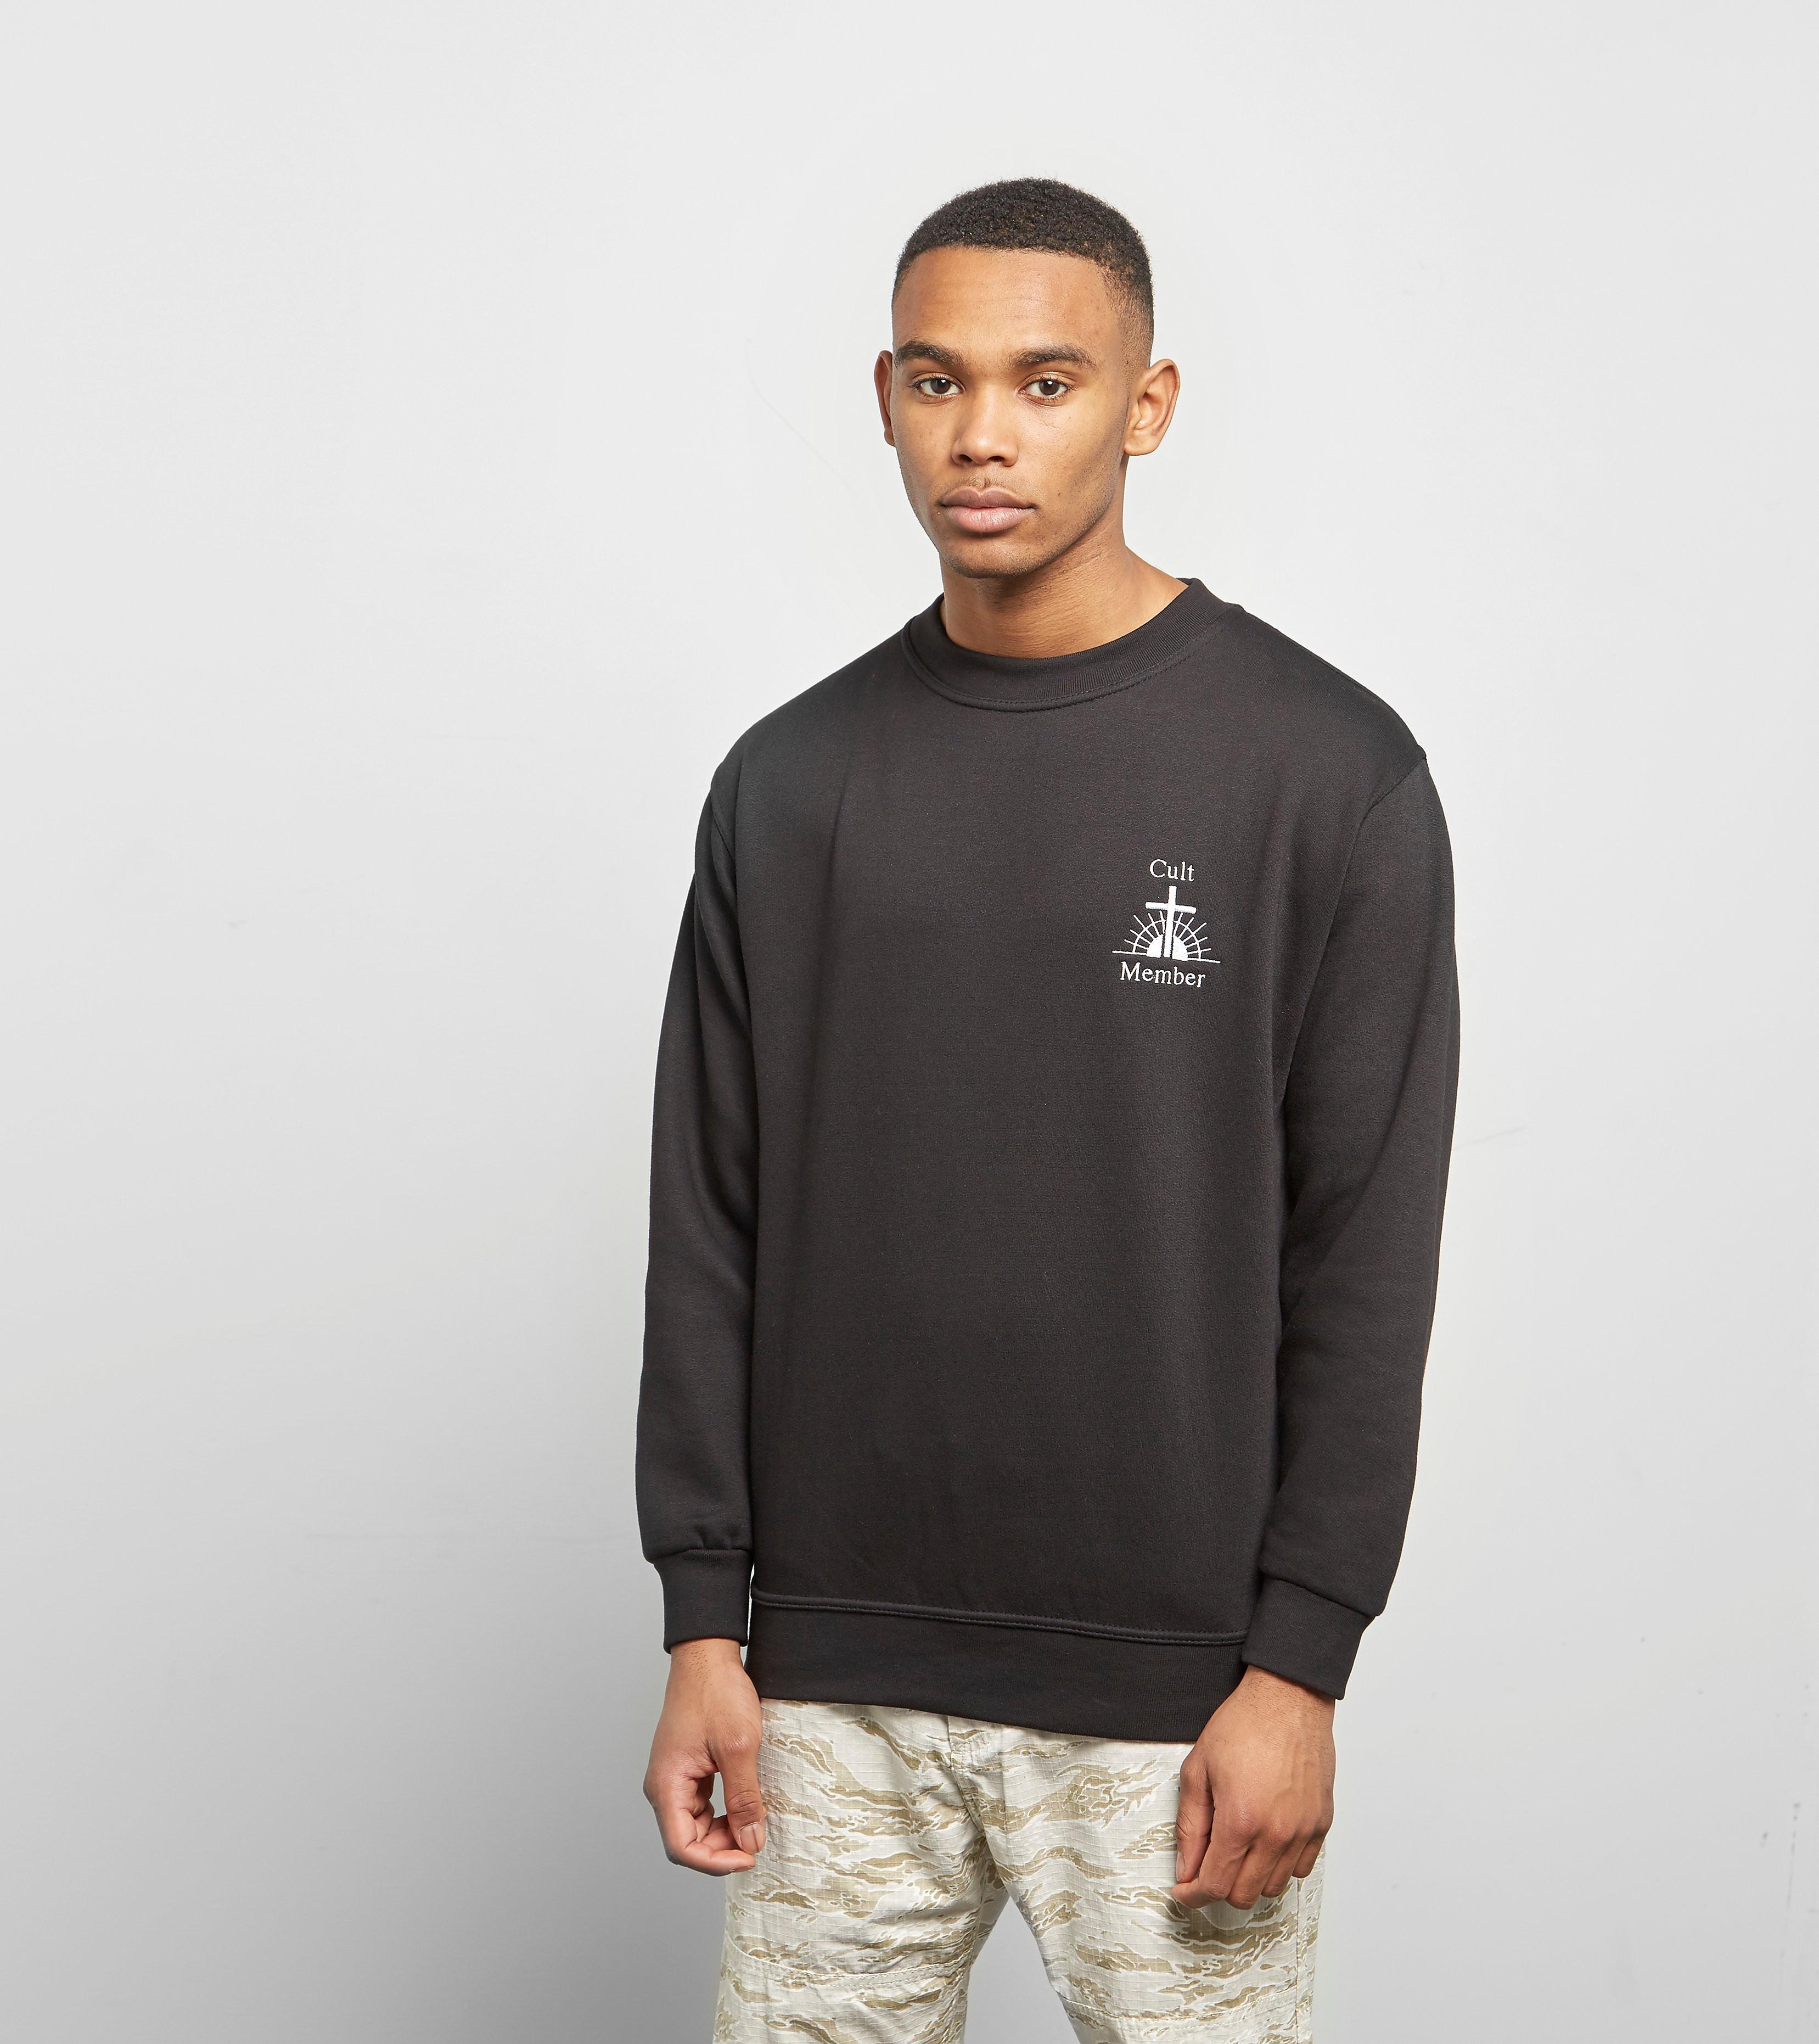 Cult Gloria Cult Member Sweatshirt